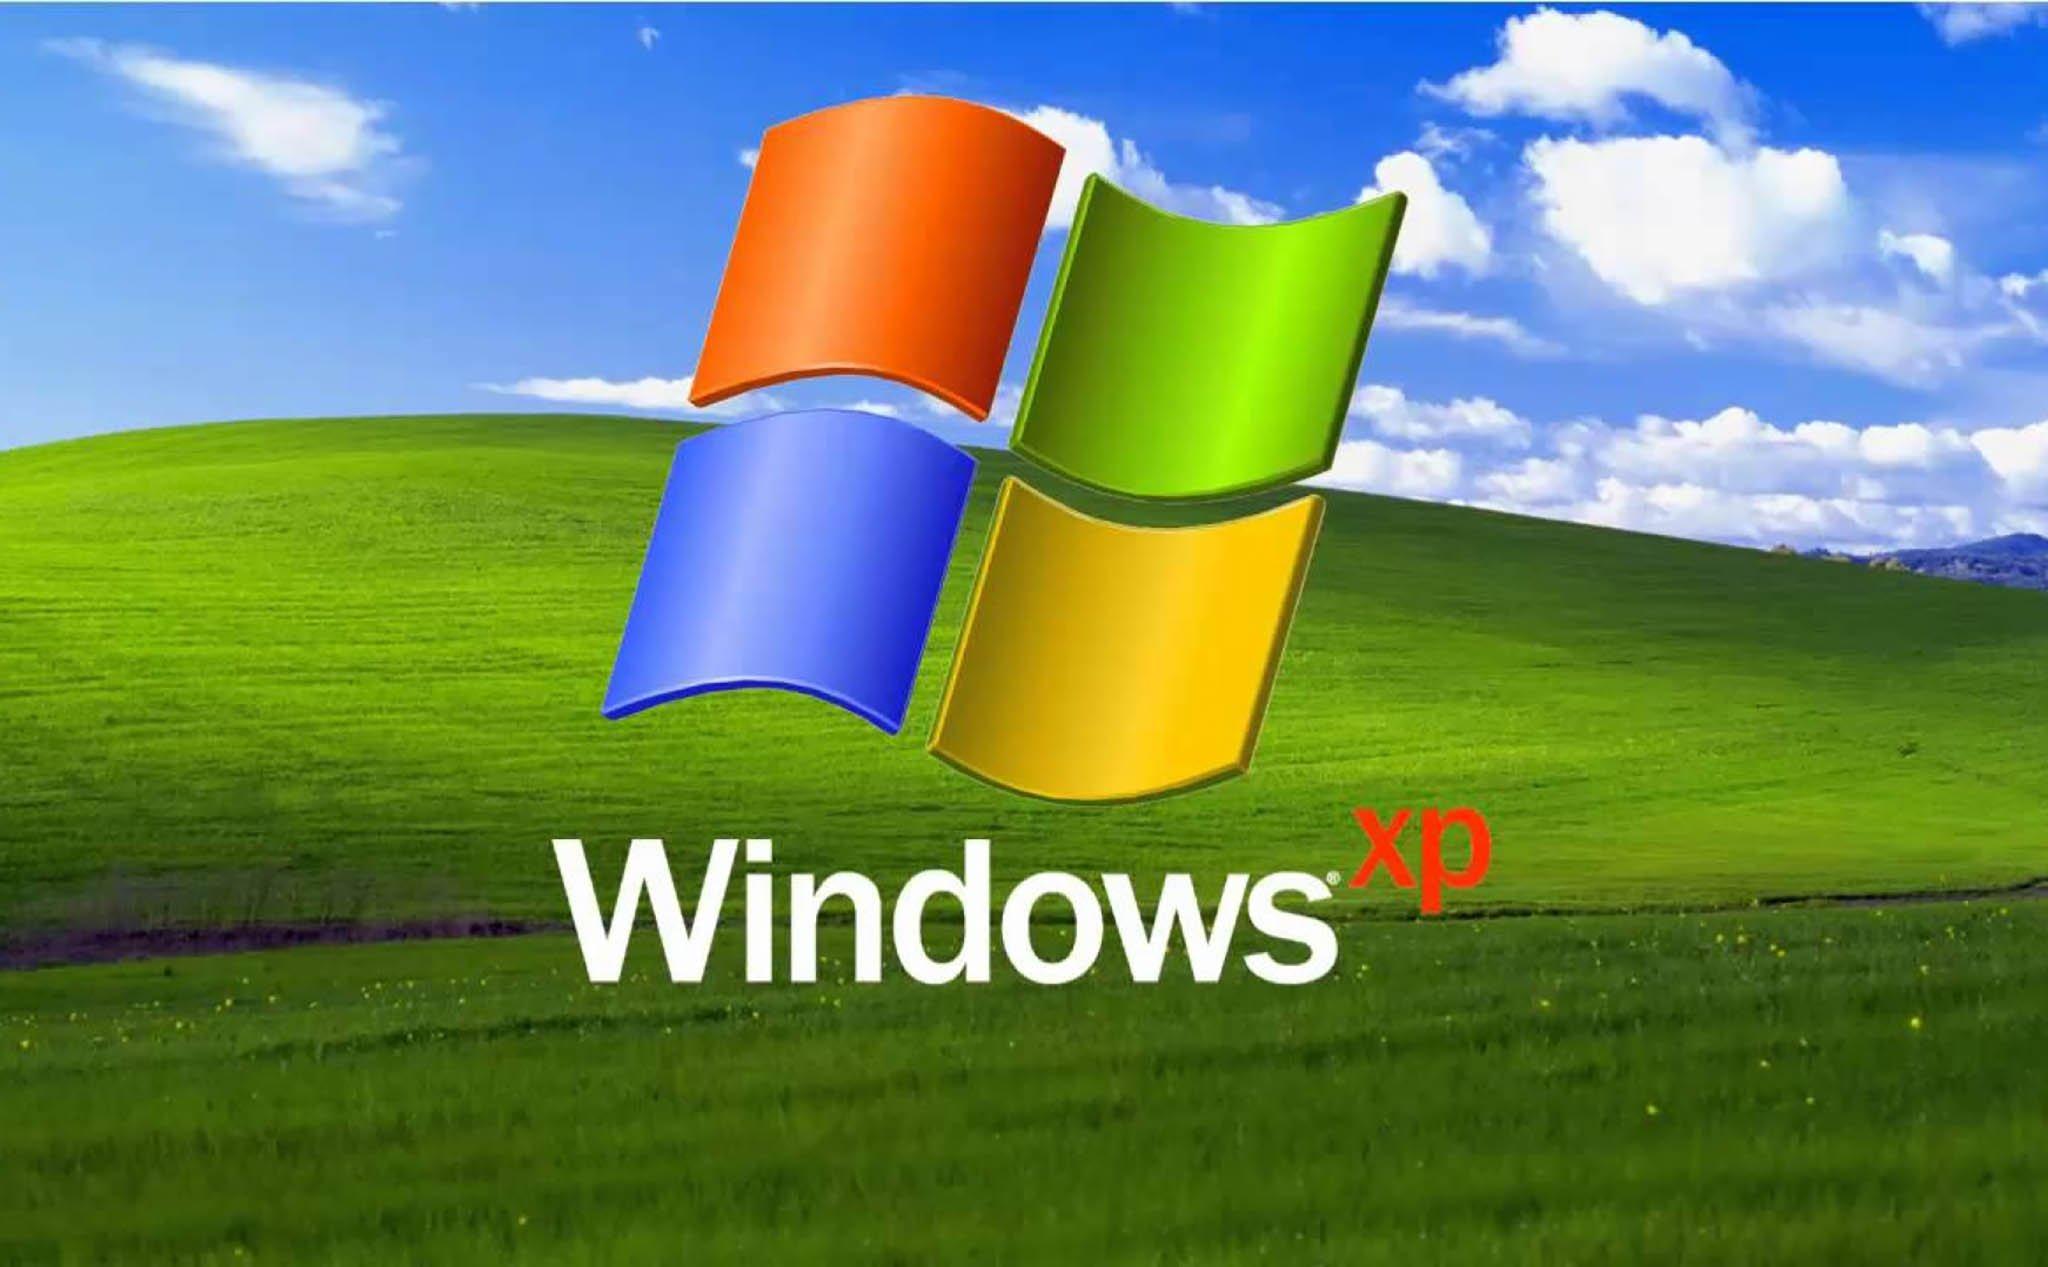 Download Windows XP 32 bit - 64 bit